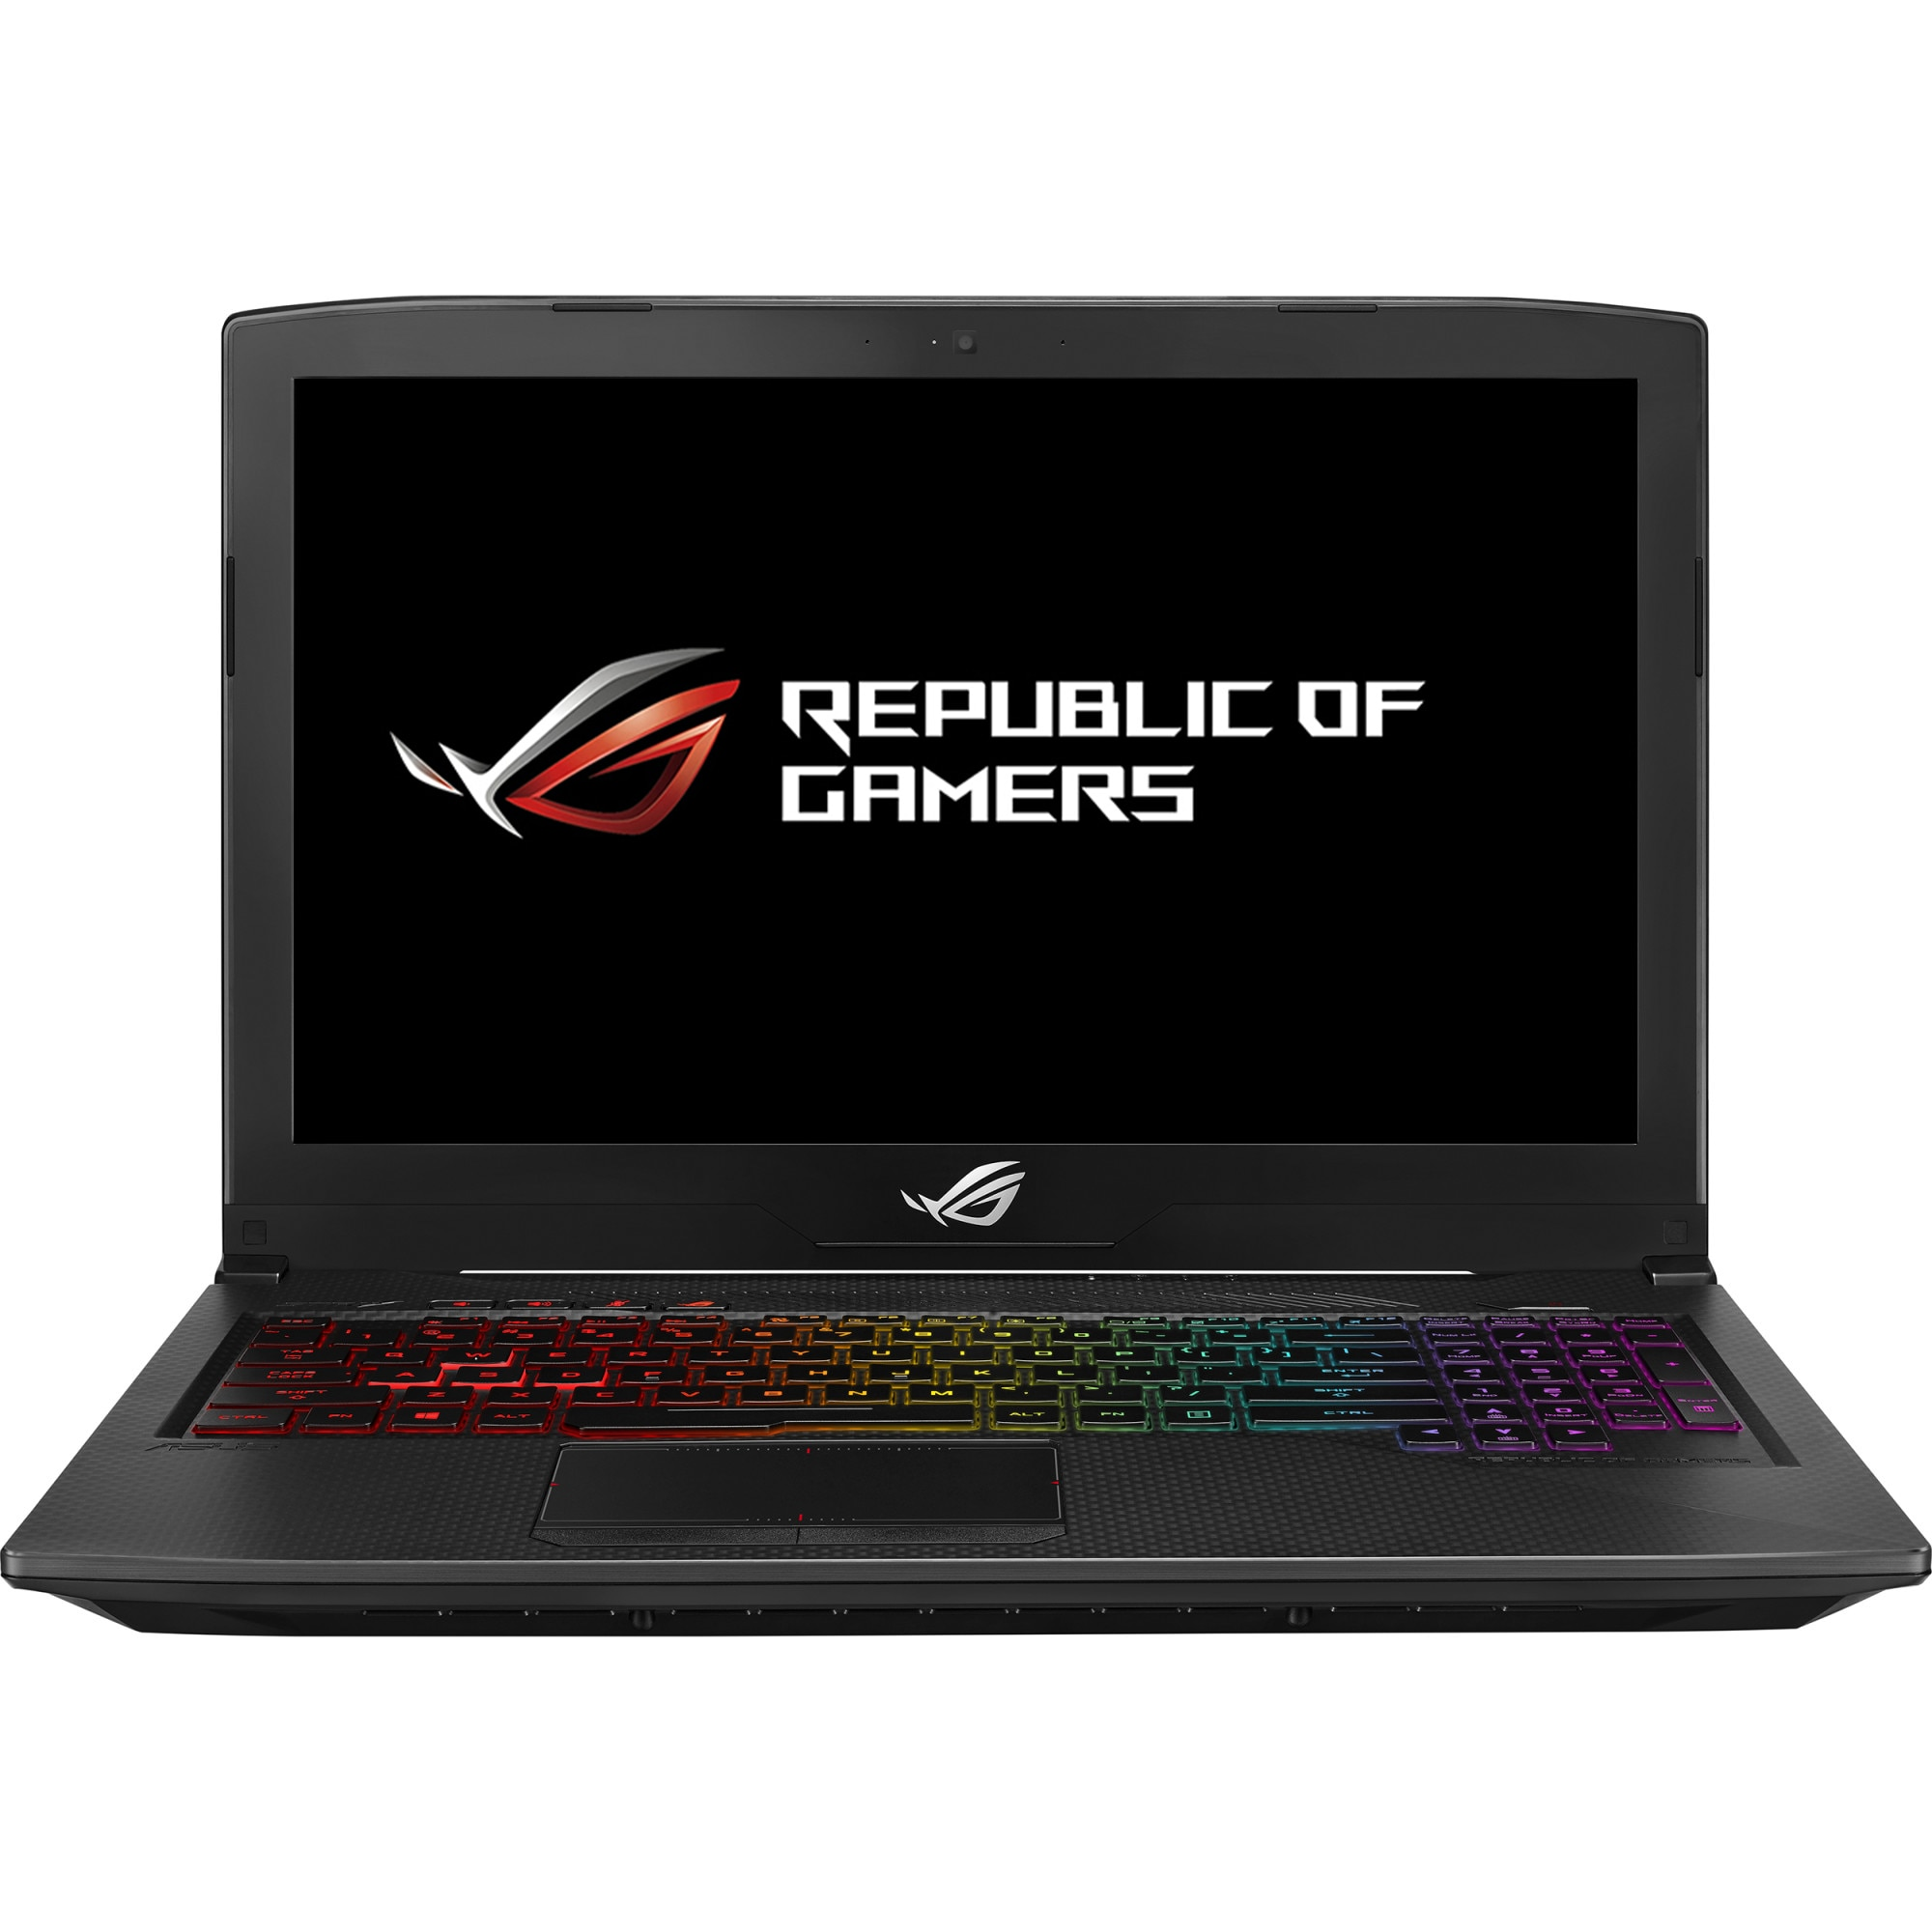 "Fotografie Laptop Gaming ASUS ROG GL703GS-E5011 SCAR Edition cu procesor Intel® Core™ i7-8750H pana la 4.10 GHz, Coffee Lake, 17.3"", Full HD, 144Hz 3ms G-Sync, 16GB, 1TB + 256GB SSD, NVIDIA GeForce 1070 8GB, Free DOS, Black"